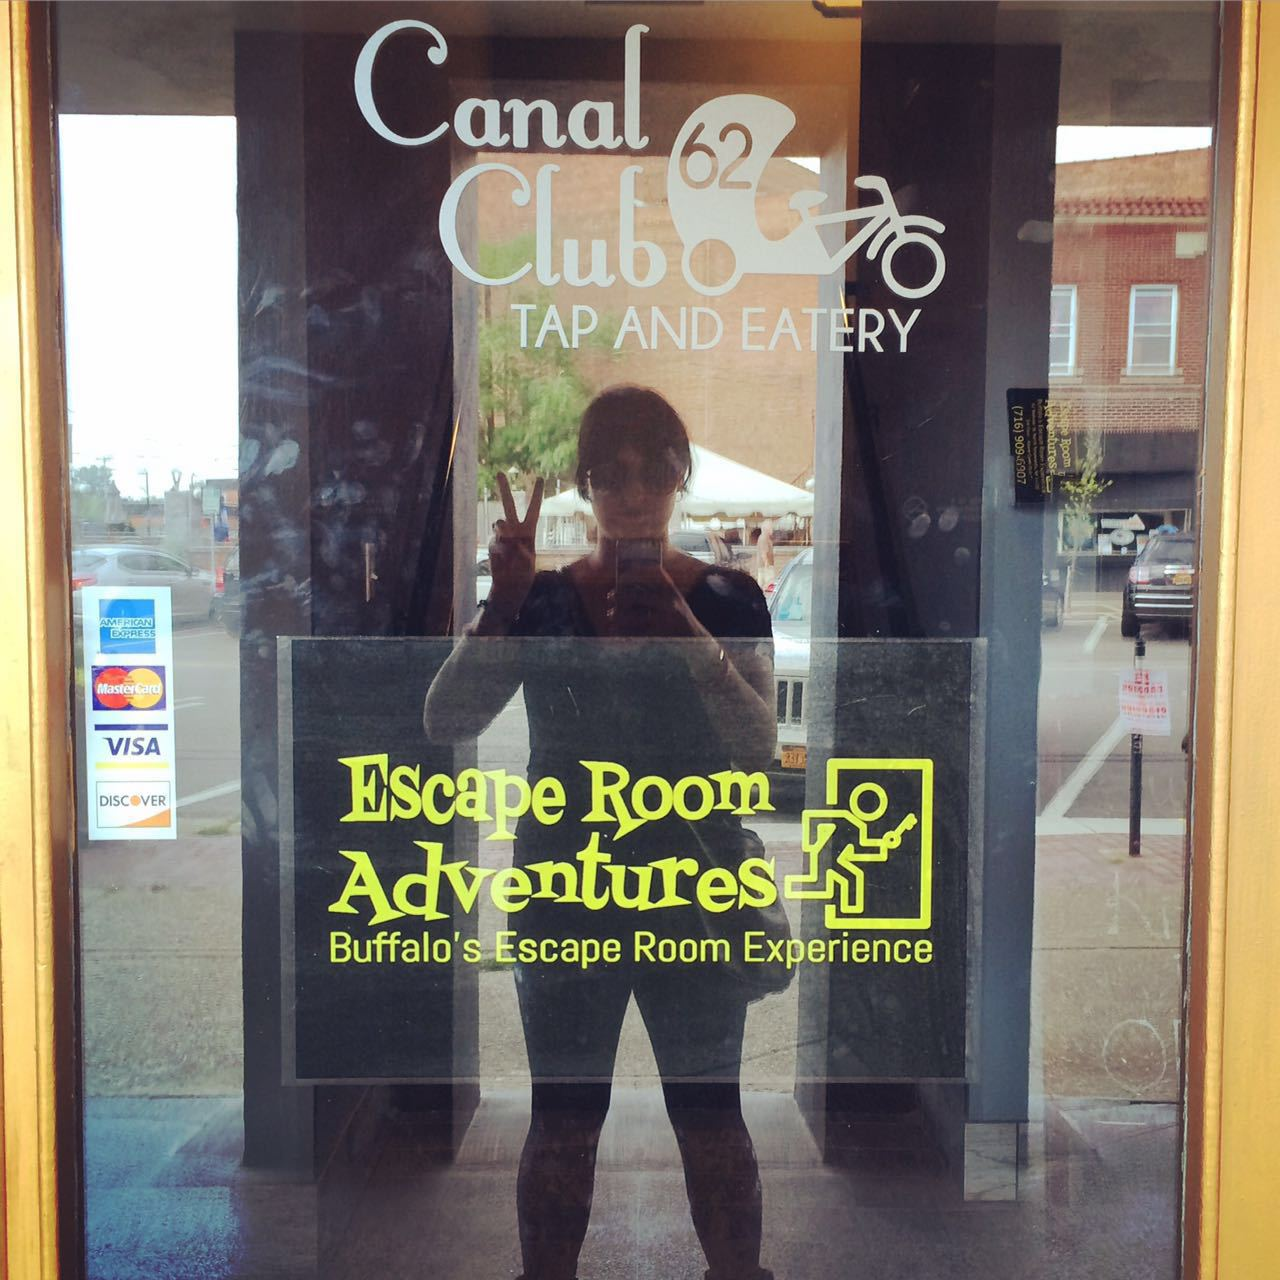 Escape Room Adventures WNY, Escape Room Buffalo, Escape Room, Canal Club 62, Webster Street, North Tonwanda, New York